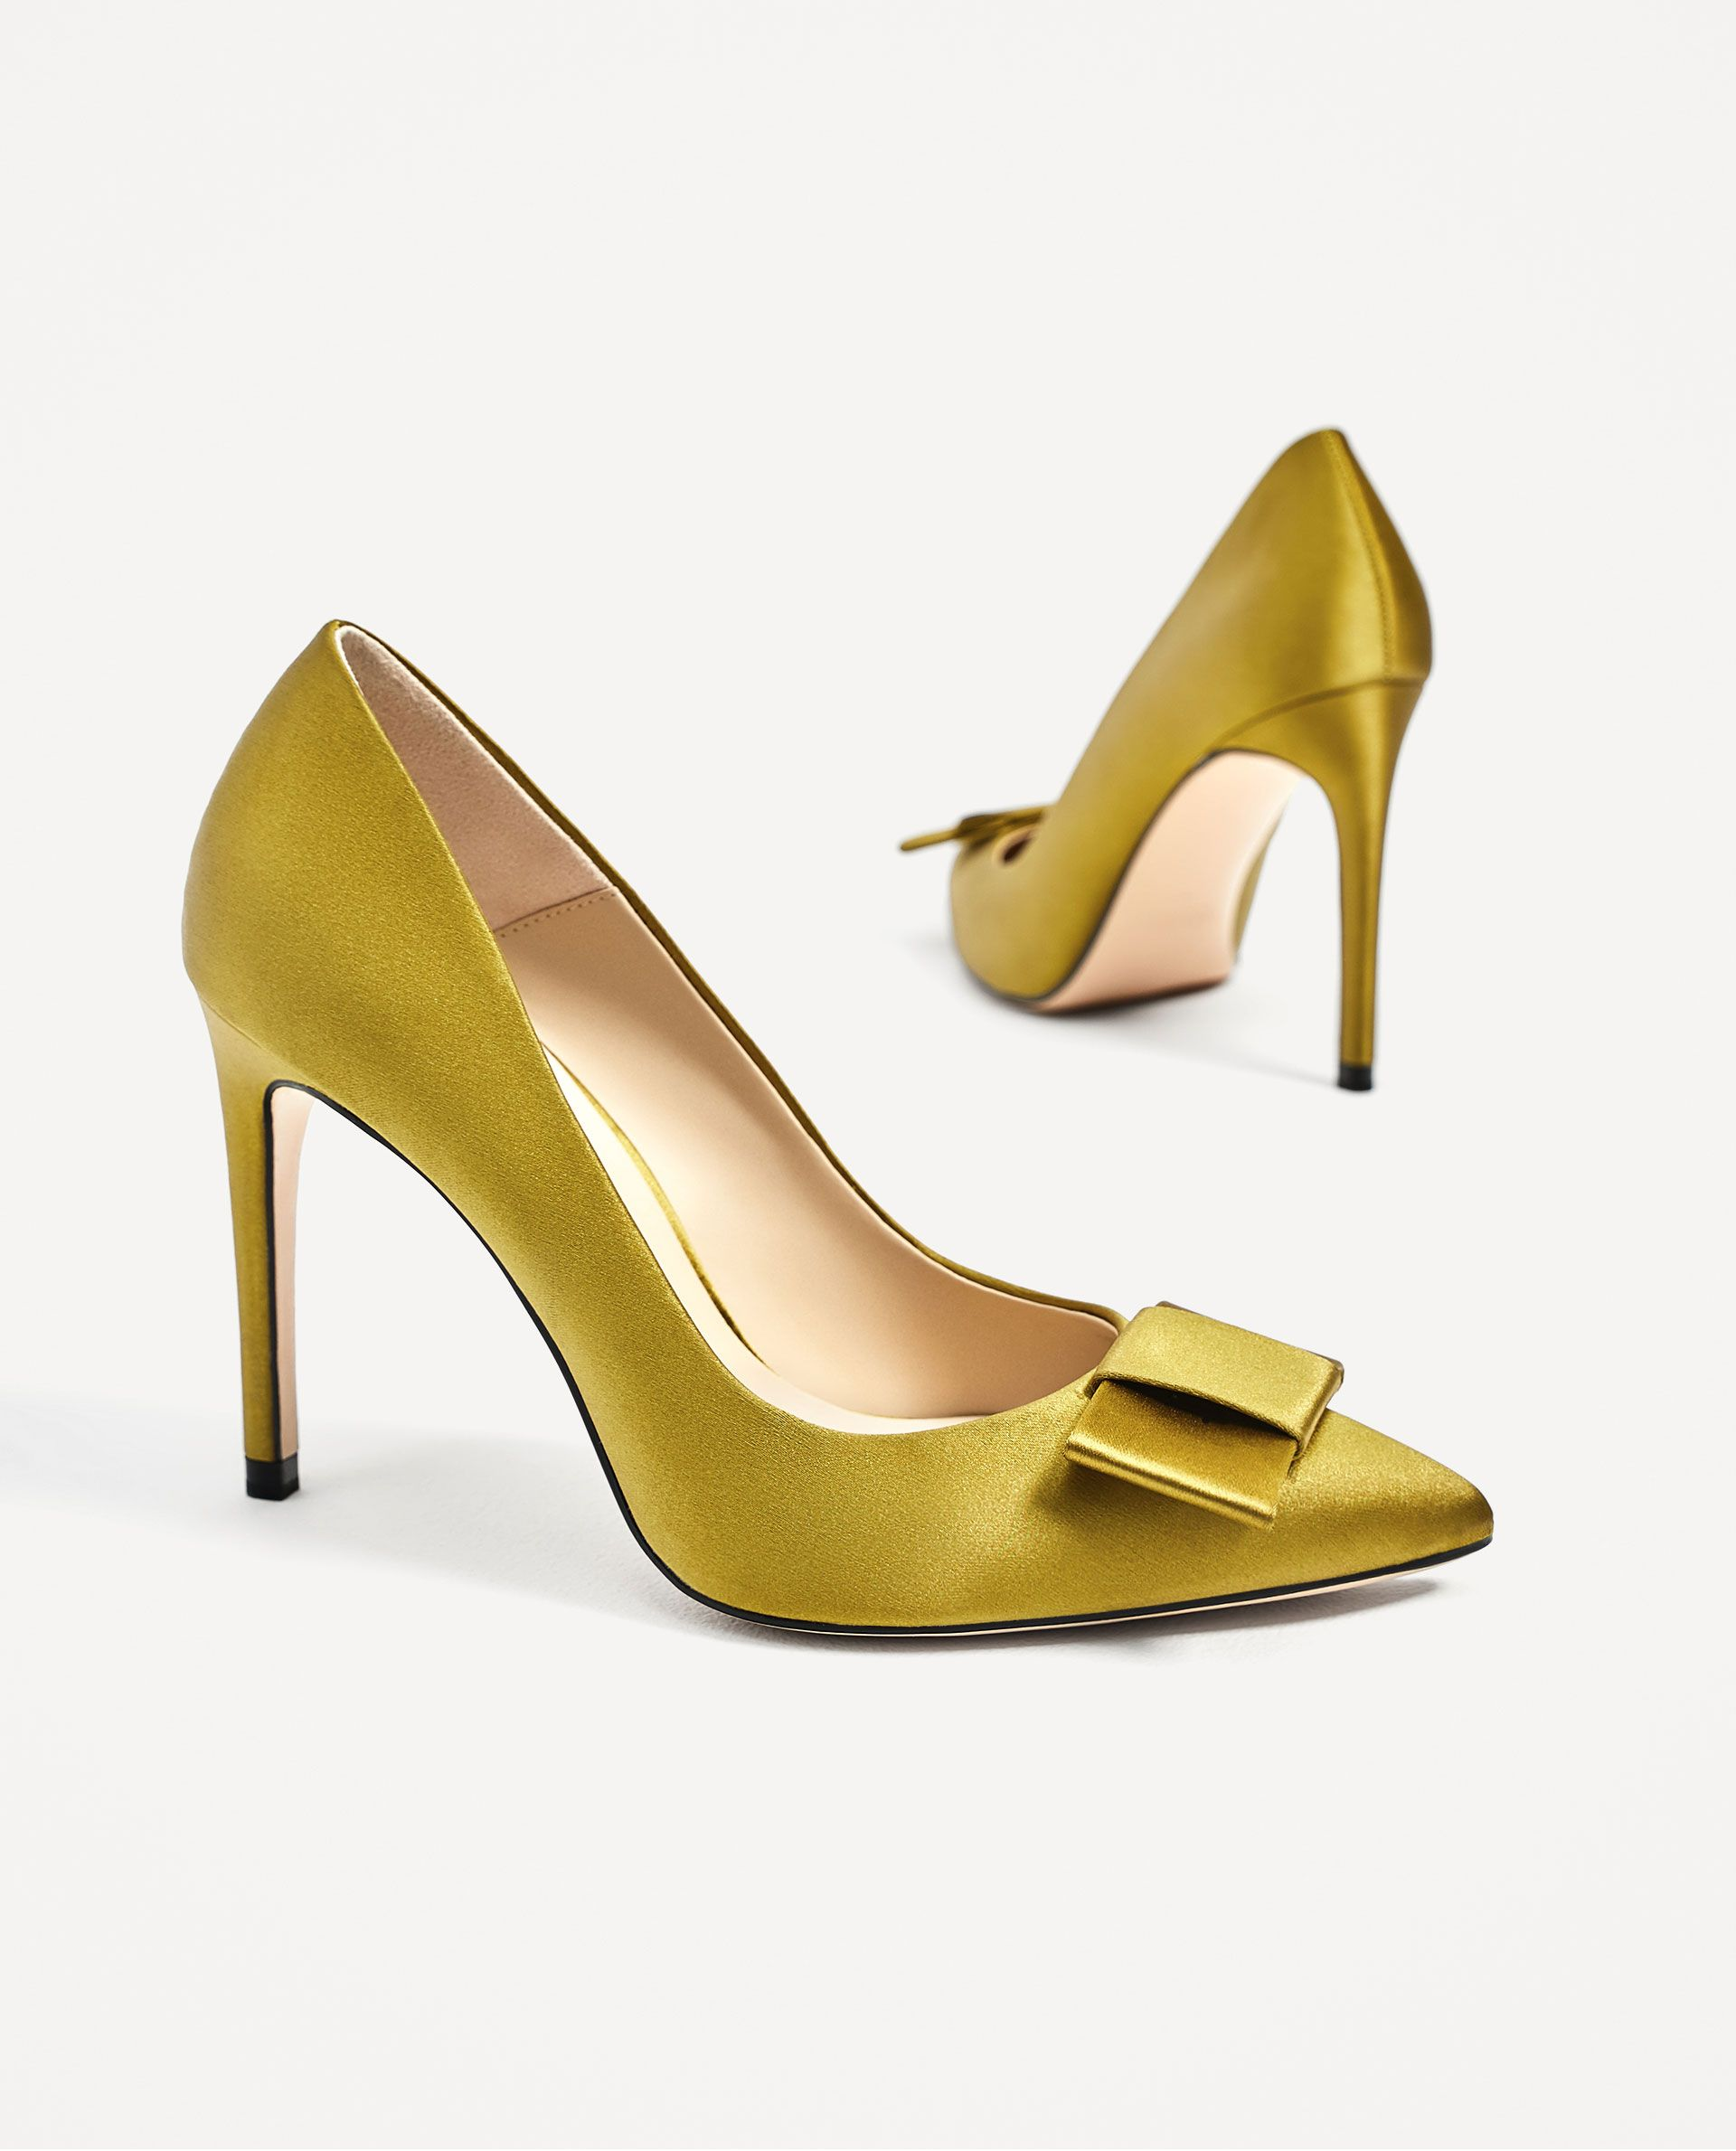 Shoesheels Mnnv80ow Lazo Satin Y Rasoshoeslt;3 Salón Zara Ib7vyYf6gm